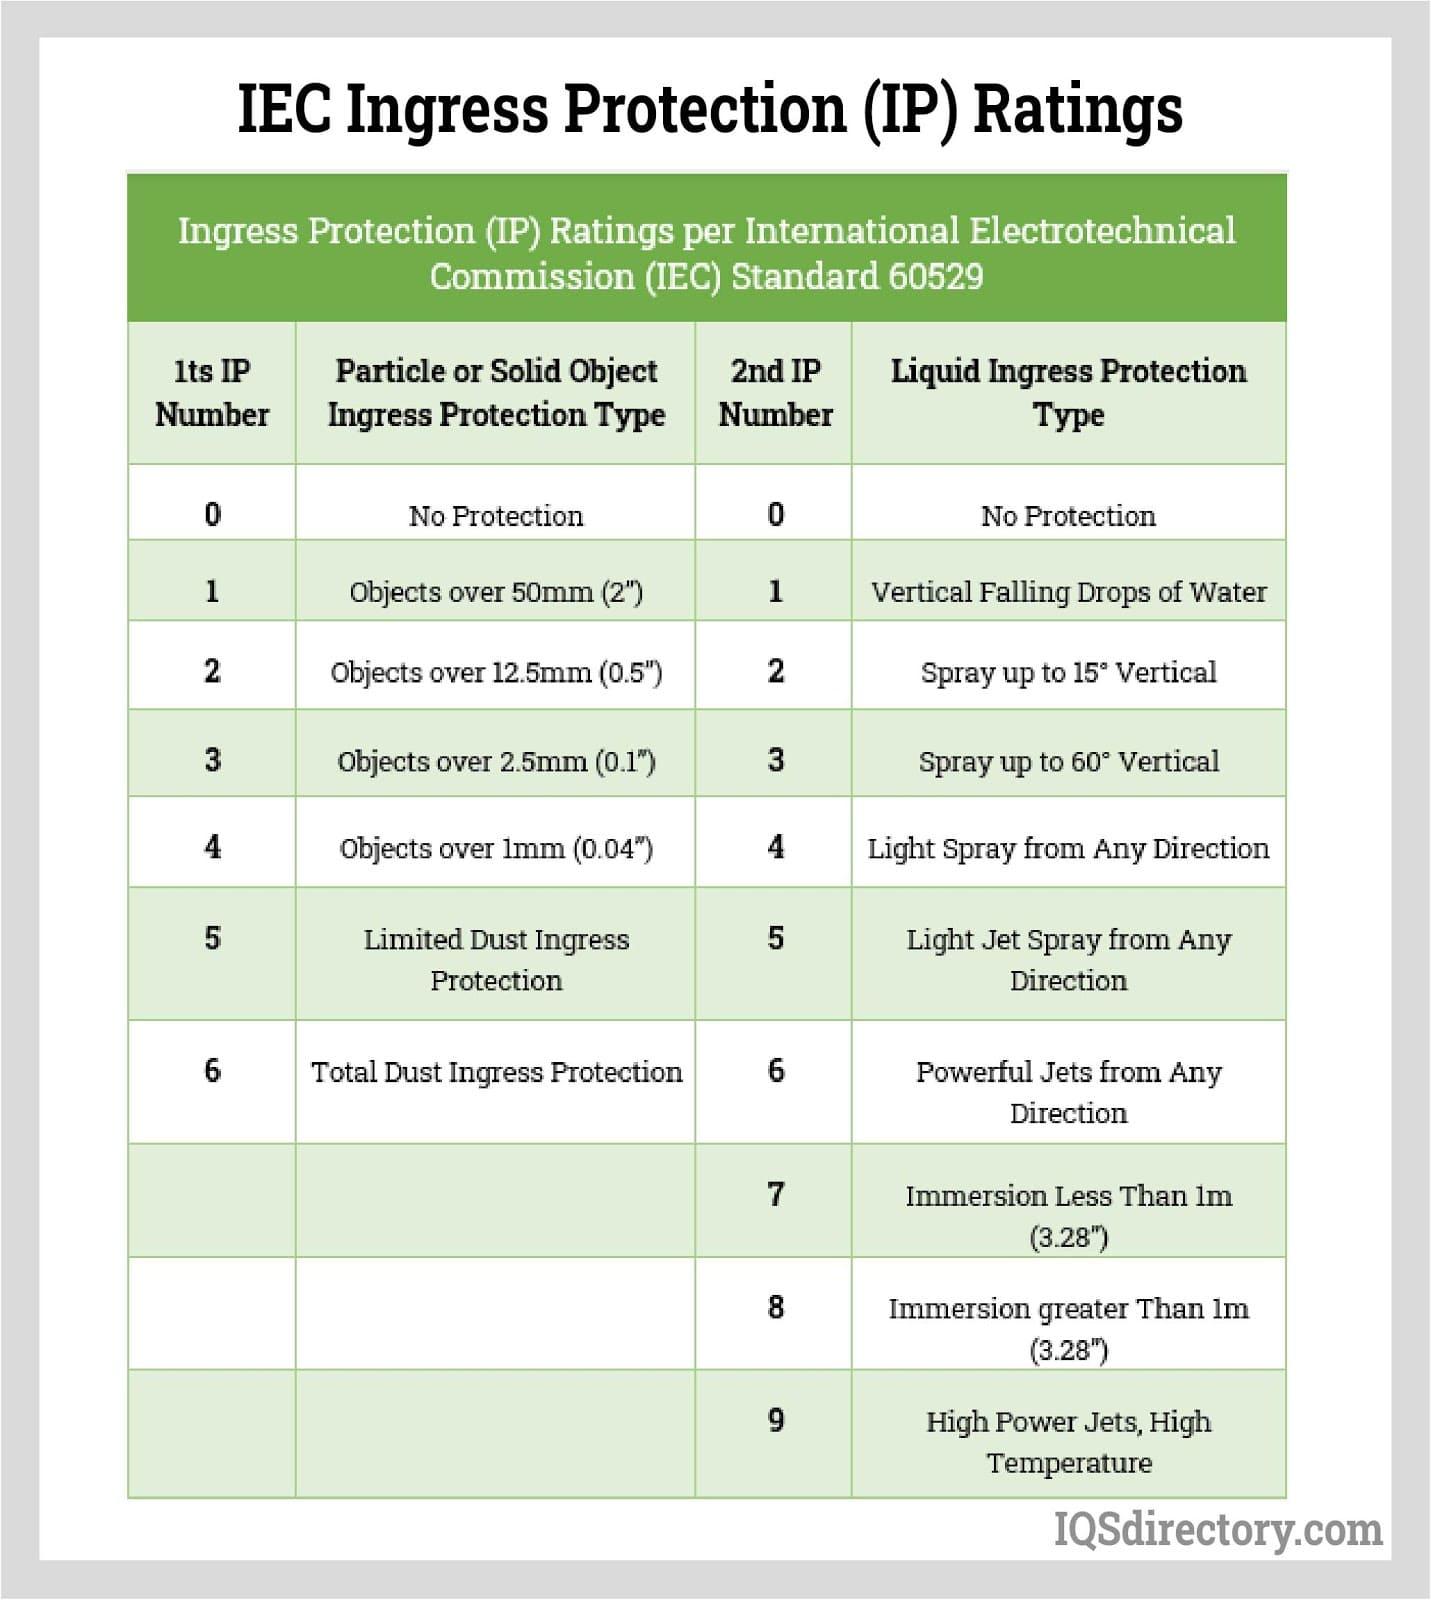 IEC Ingress Protection (IP) Ratings